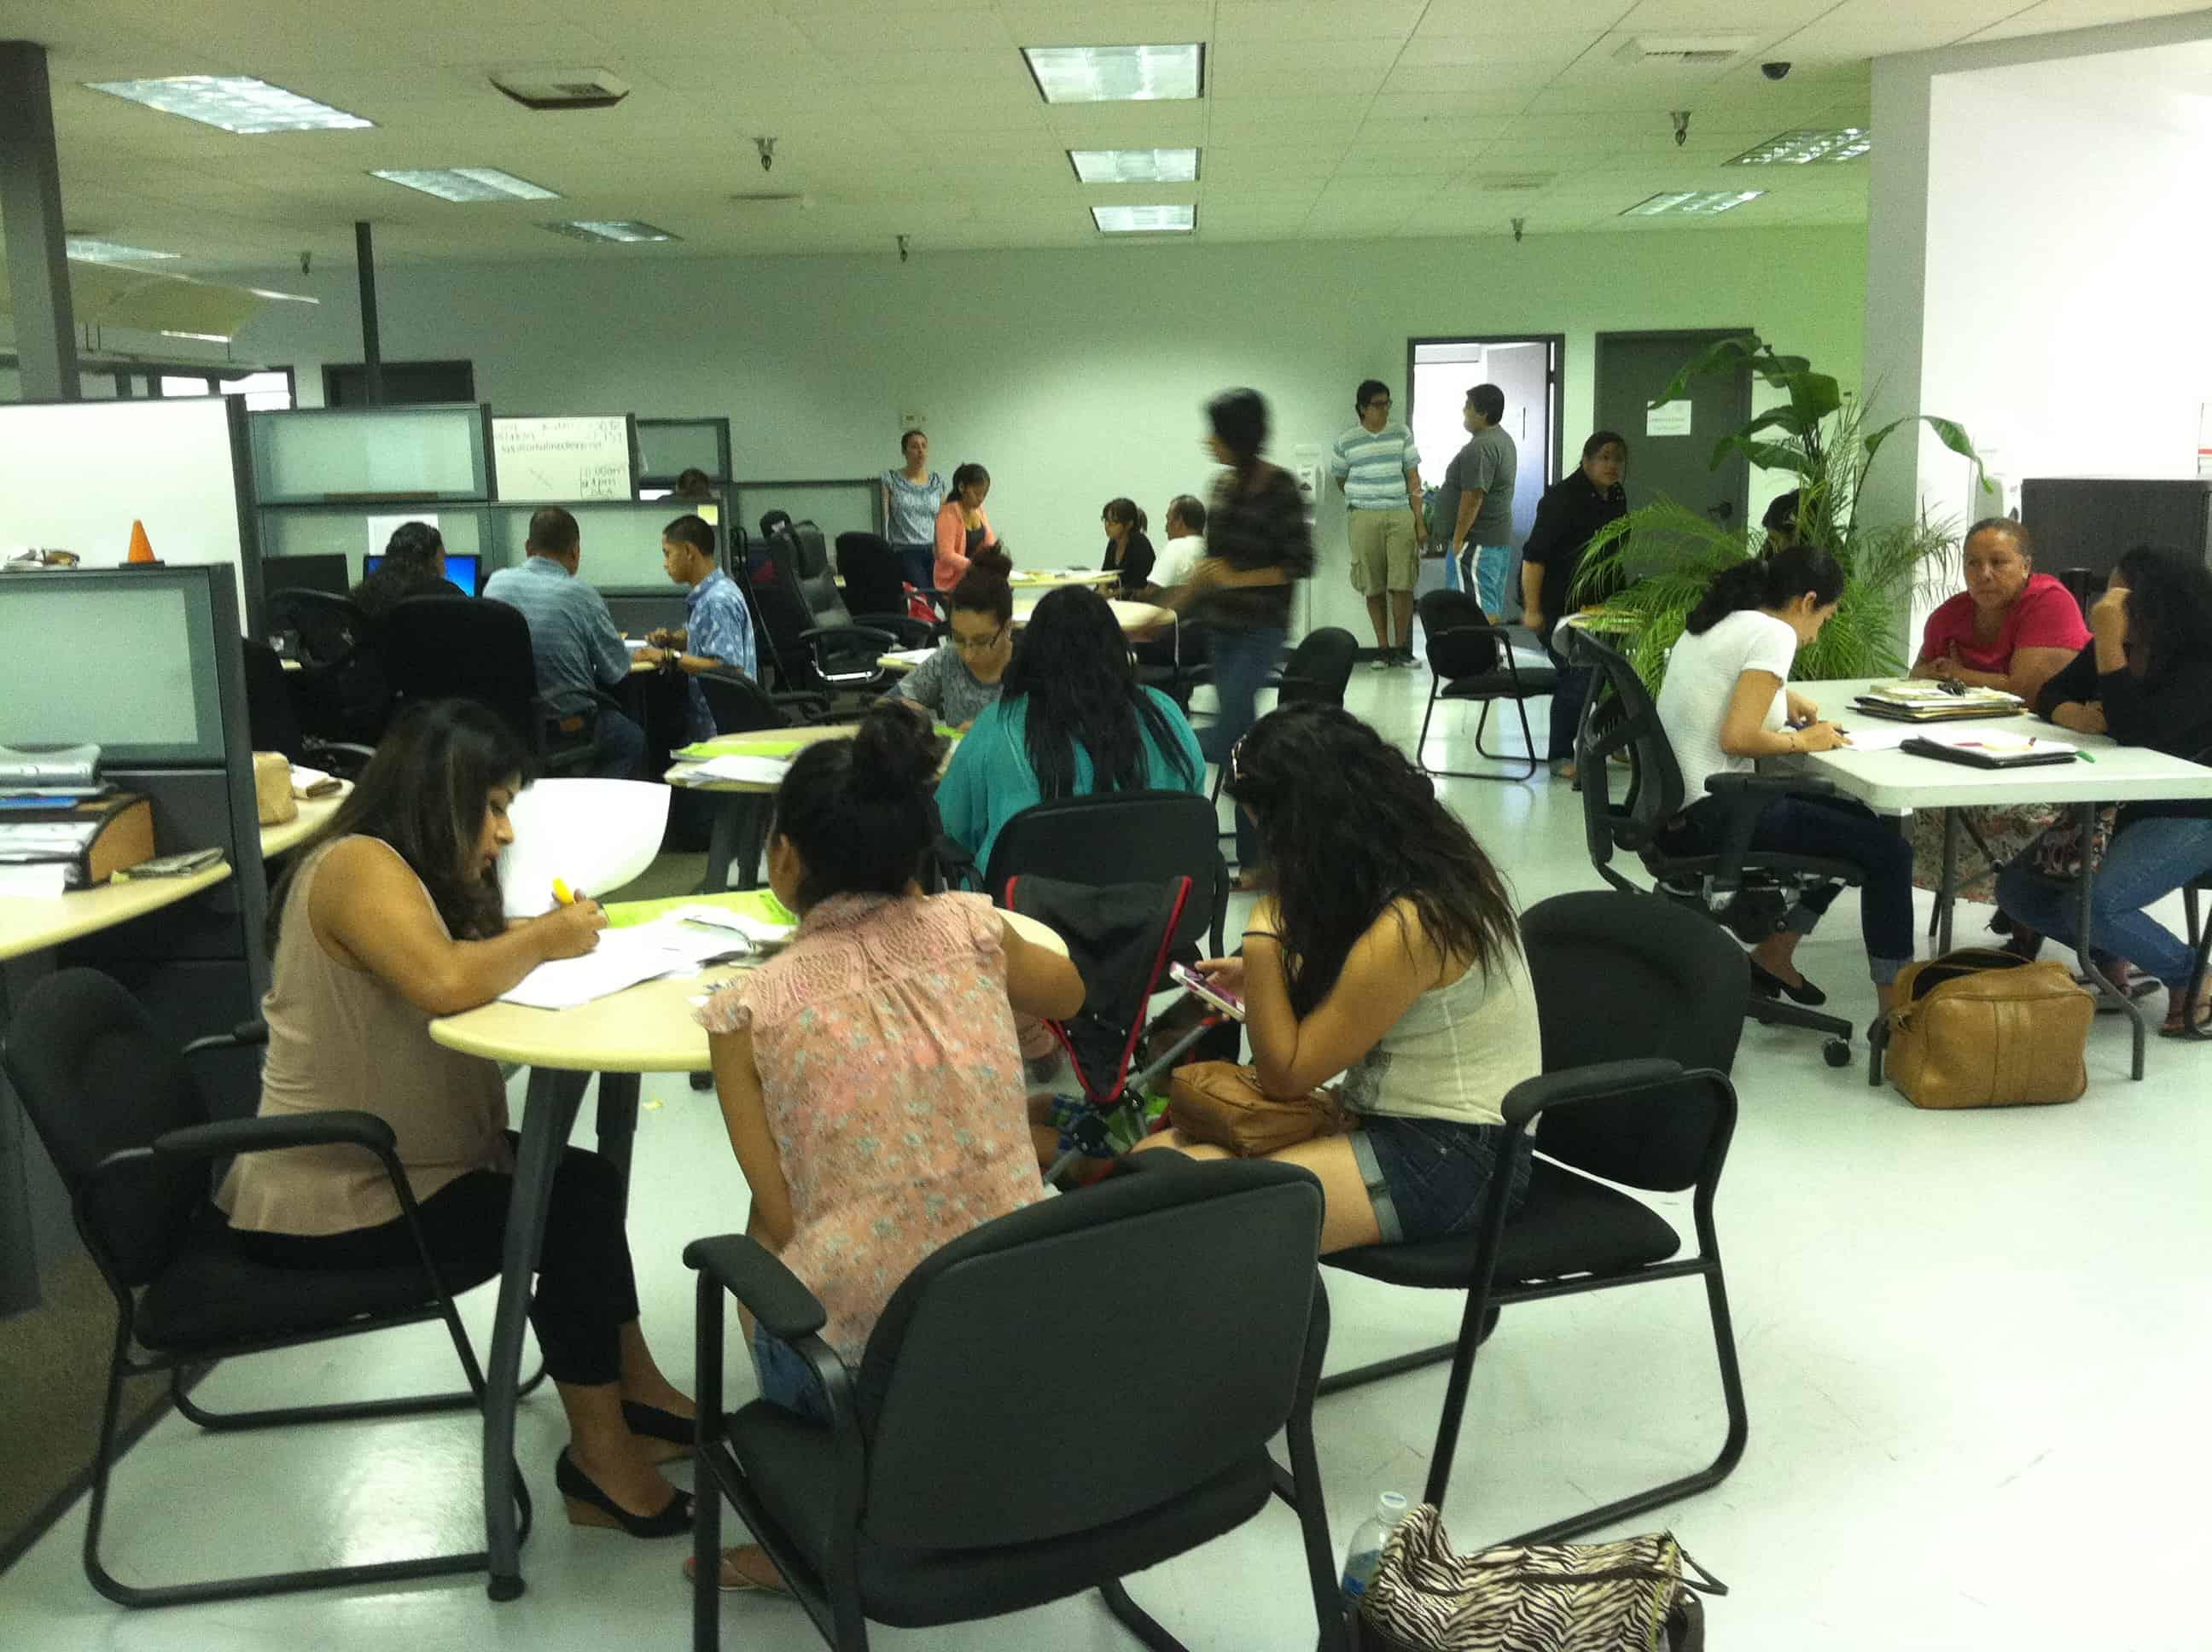 Talleres de Renovacion de DACA en Fresno 28 y 29 de Noviembre, Consulado de Mexico